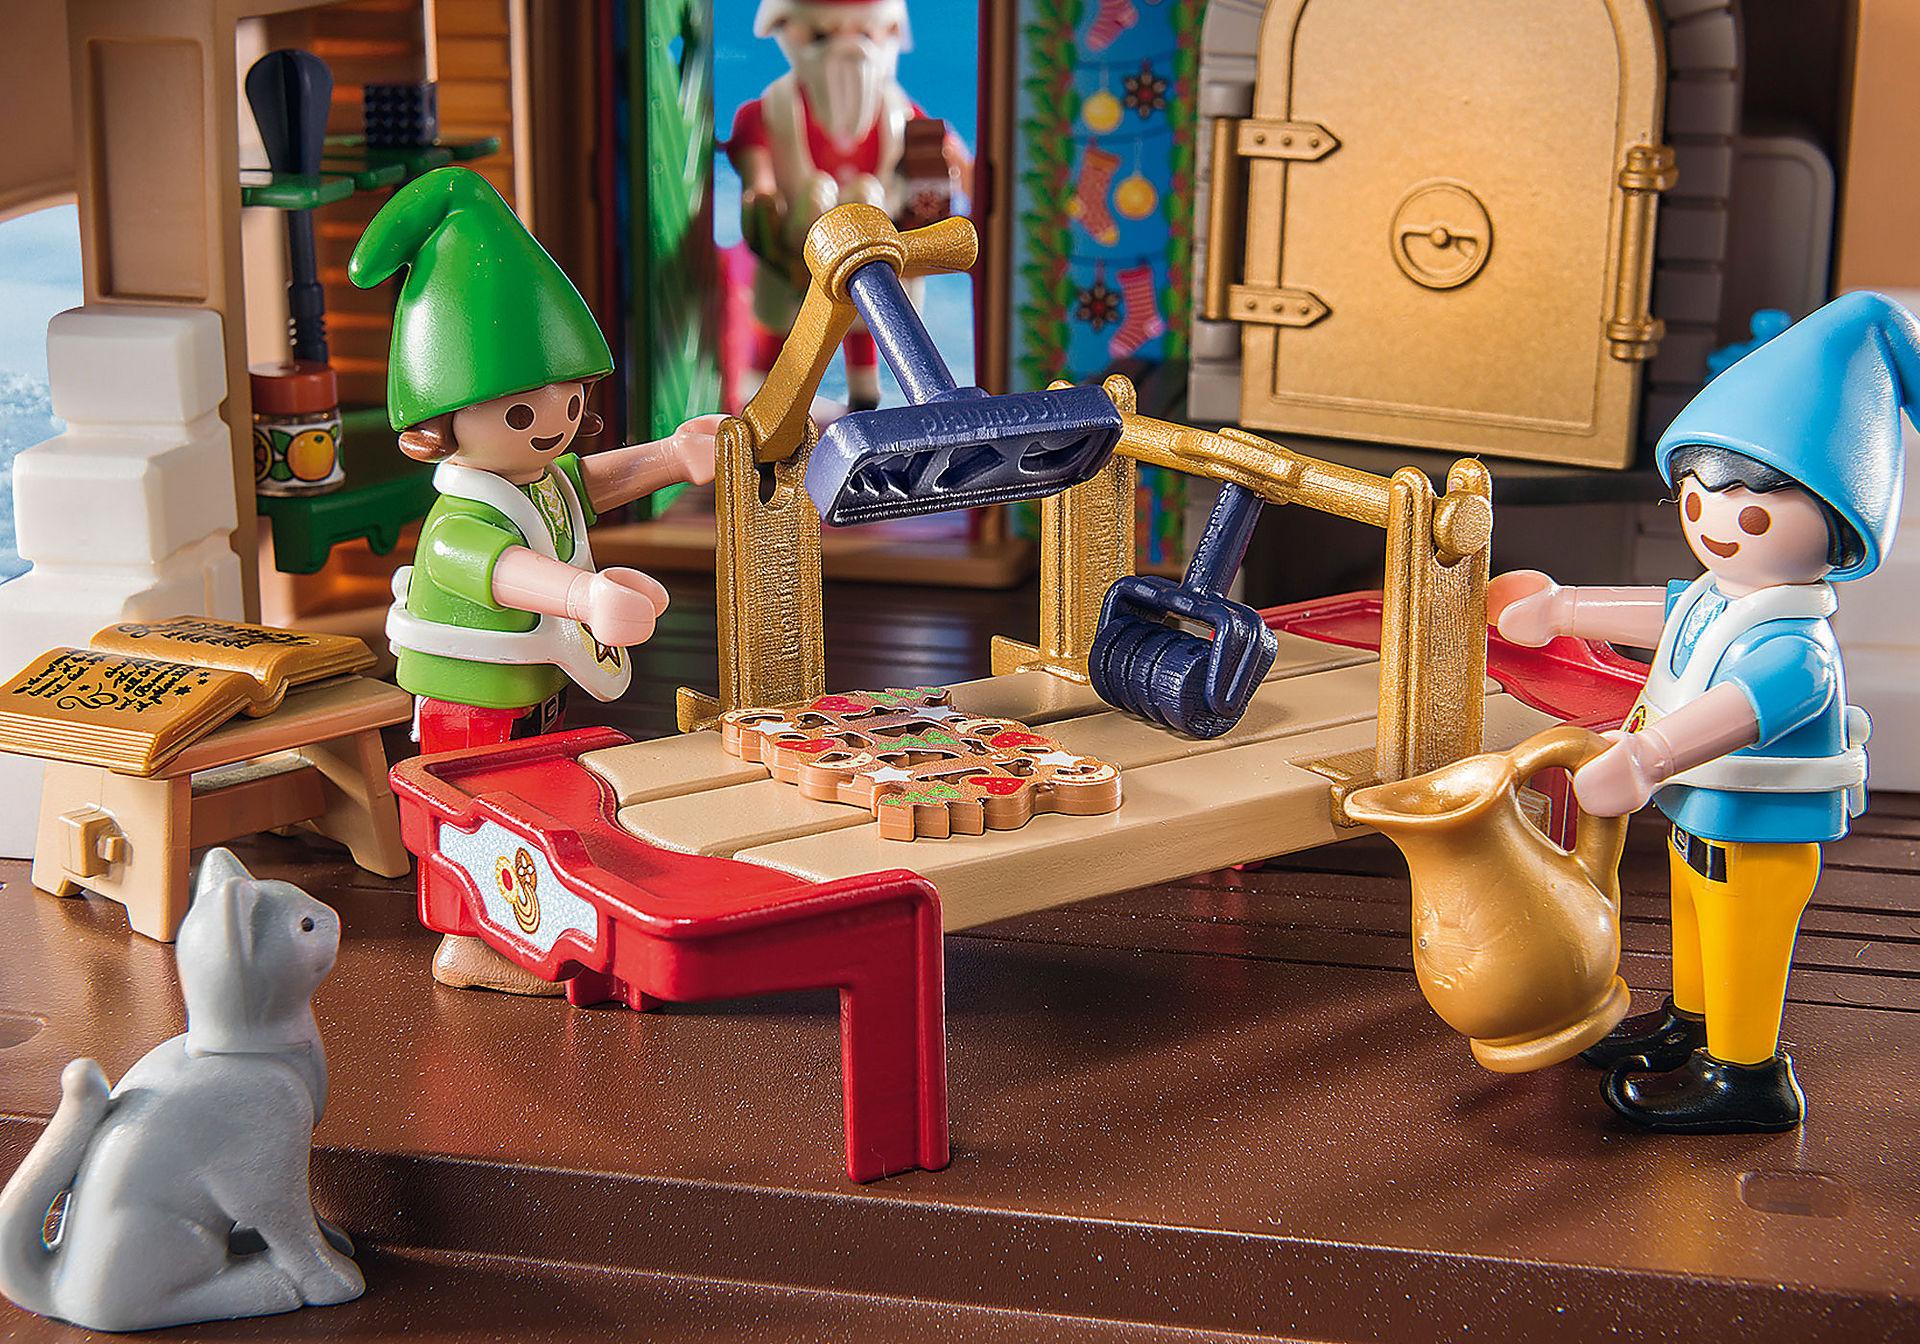 http://media.playmobil.com/i/playmobil/9493_product_extra3/Weihnachtsbäckerei mit Plätzchenformen